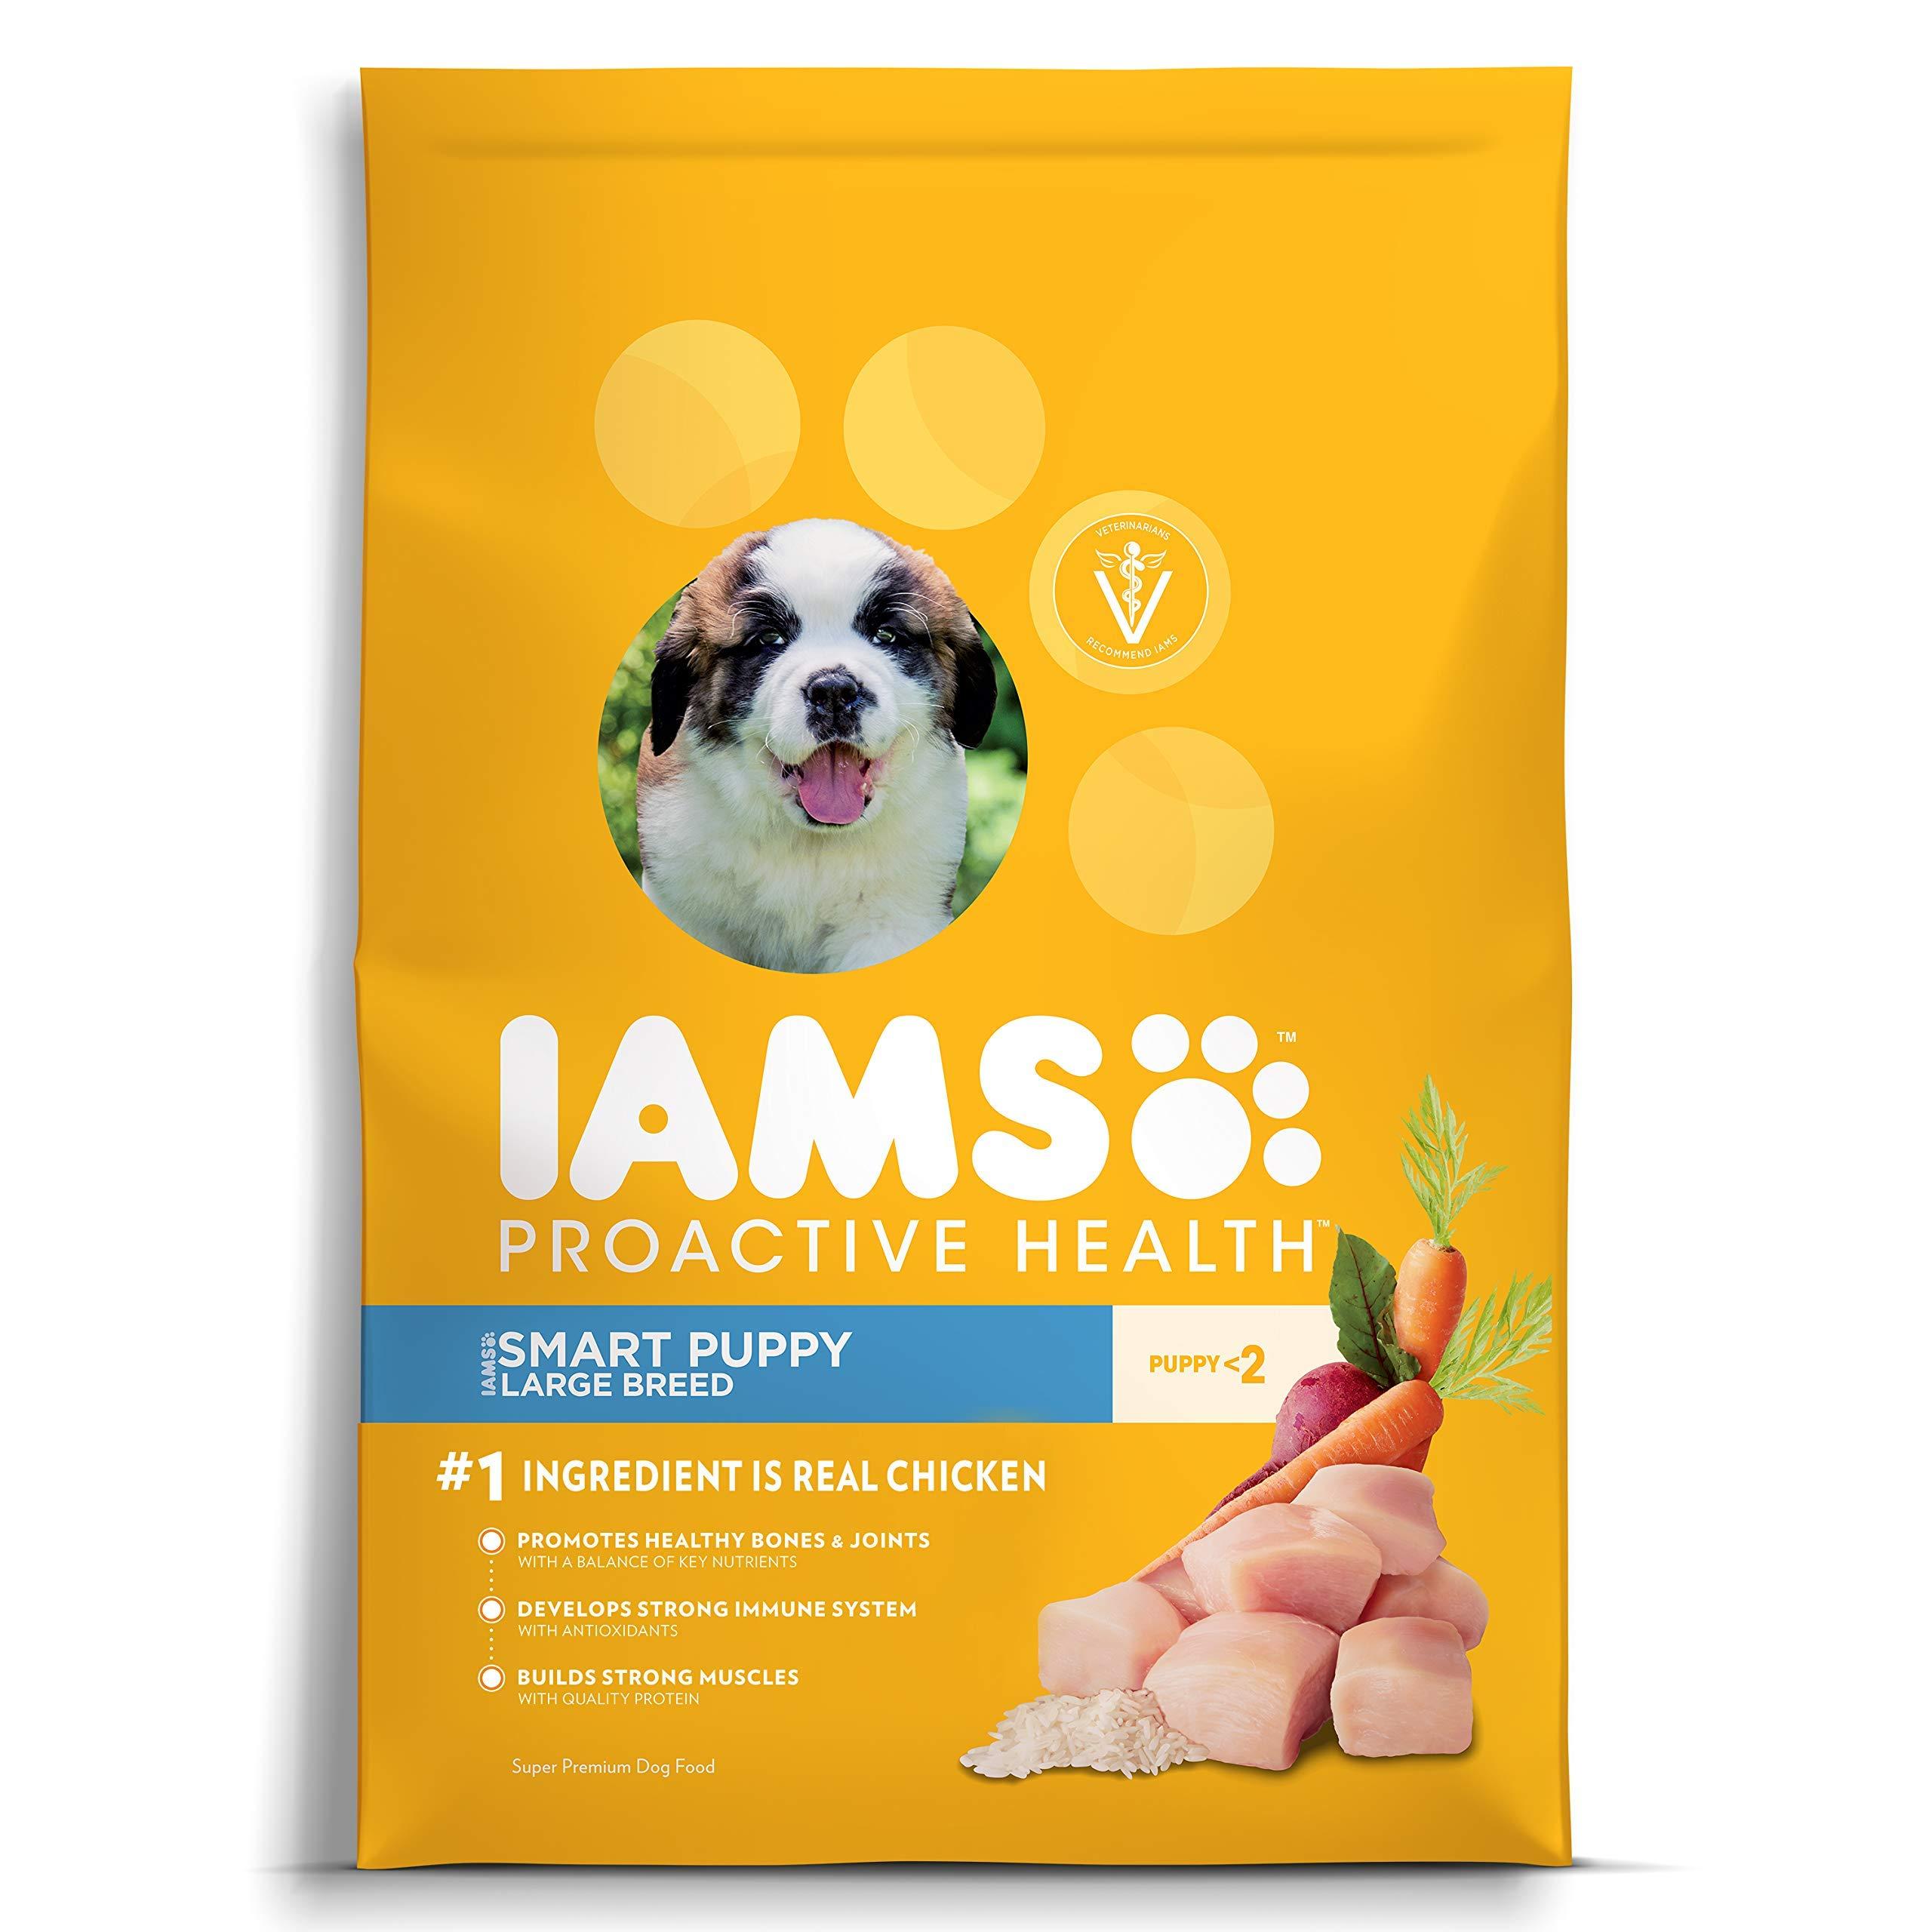 Iams Proactive Health Puppy Dry Dog Food – Chicken